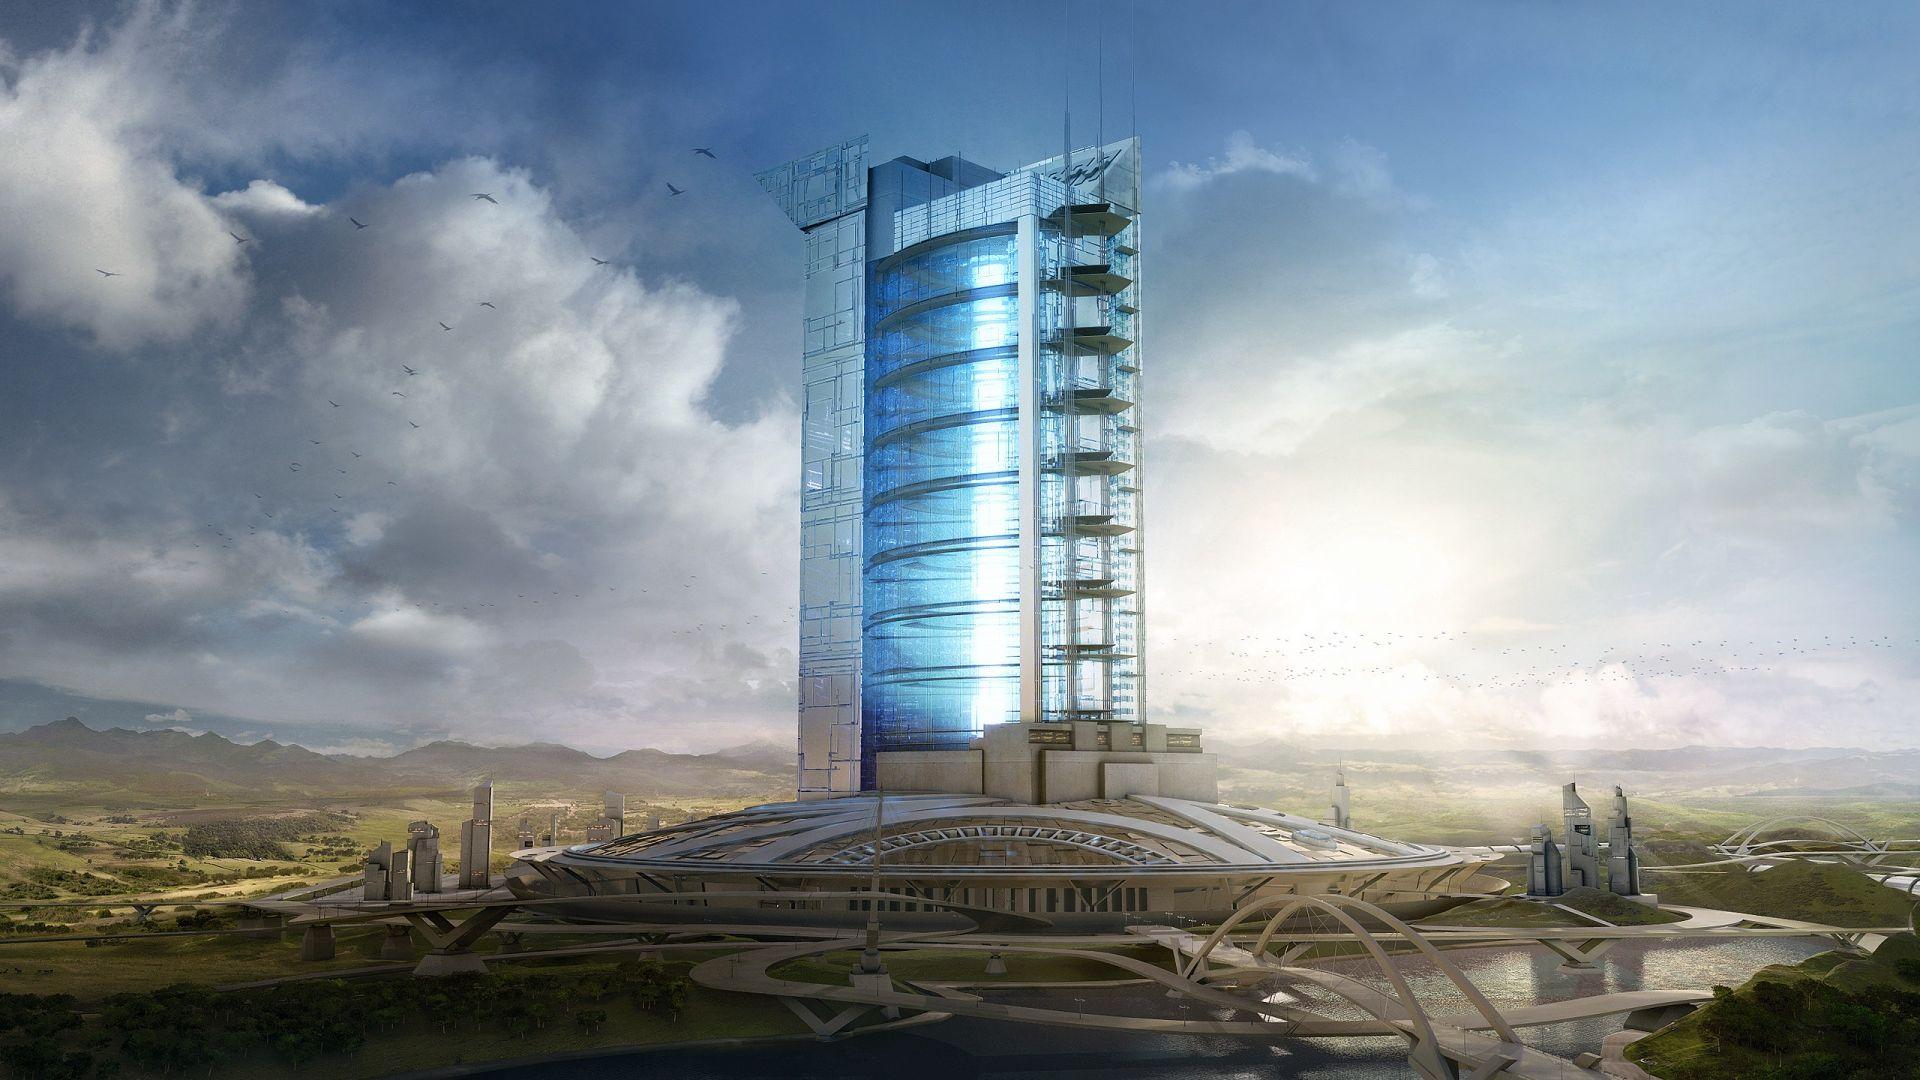 Architecture futuriste 3d 10 000 fonds d 39 cran hd for Architecture futuriste